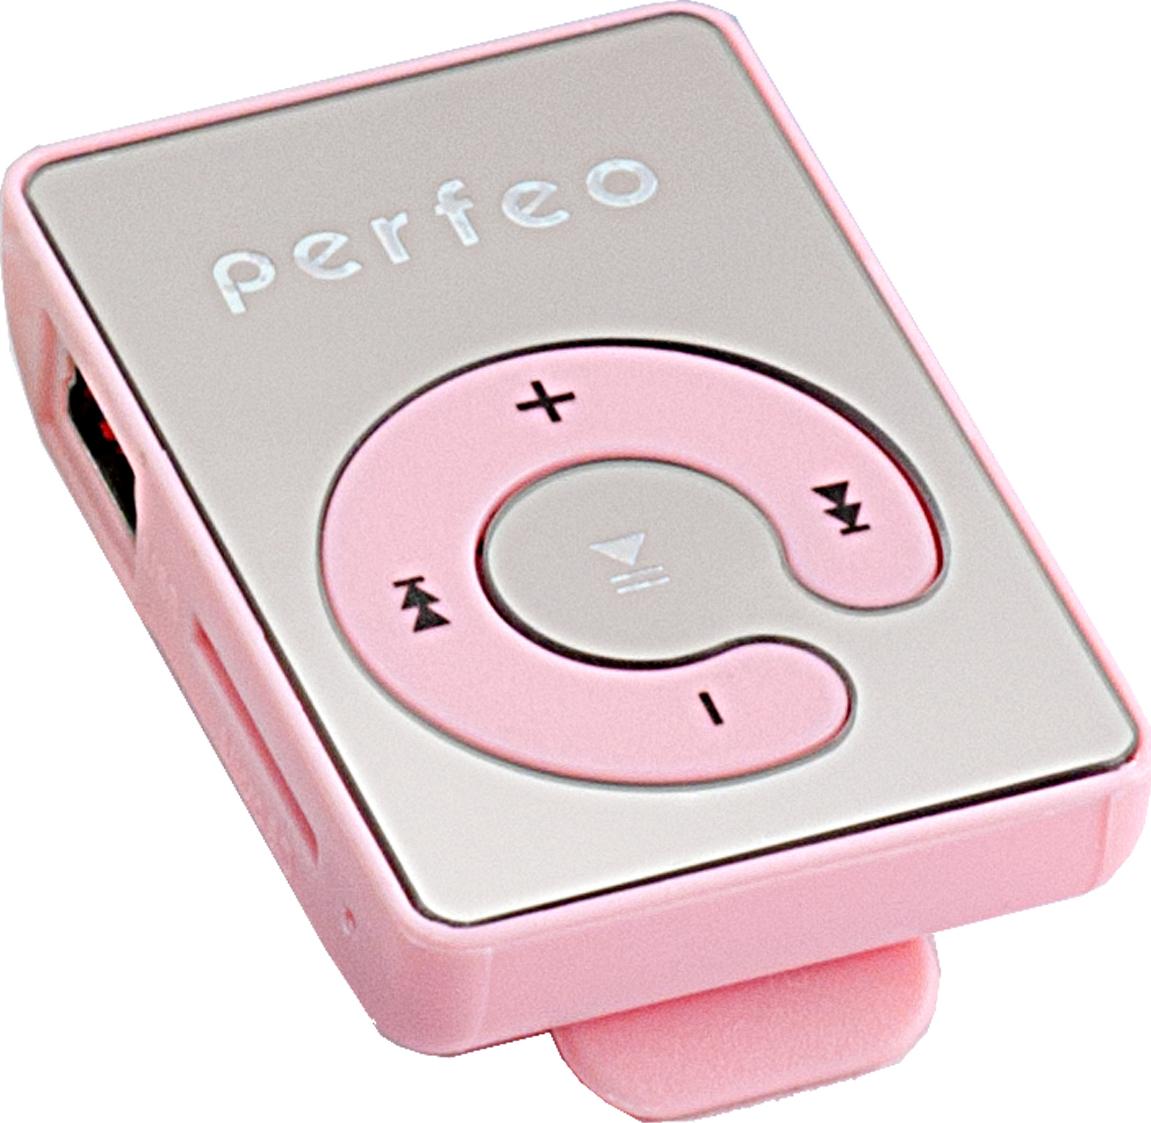 Цифровой аудио плеер Perfeo Music Clip Color, серебристо-розовый Perfeo